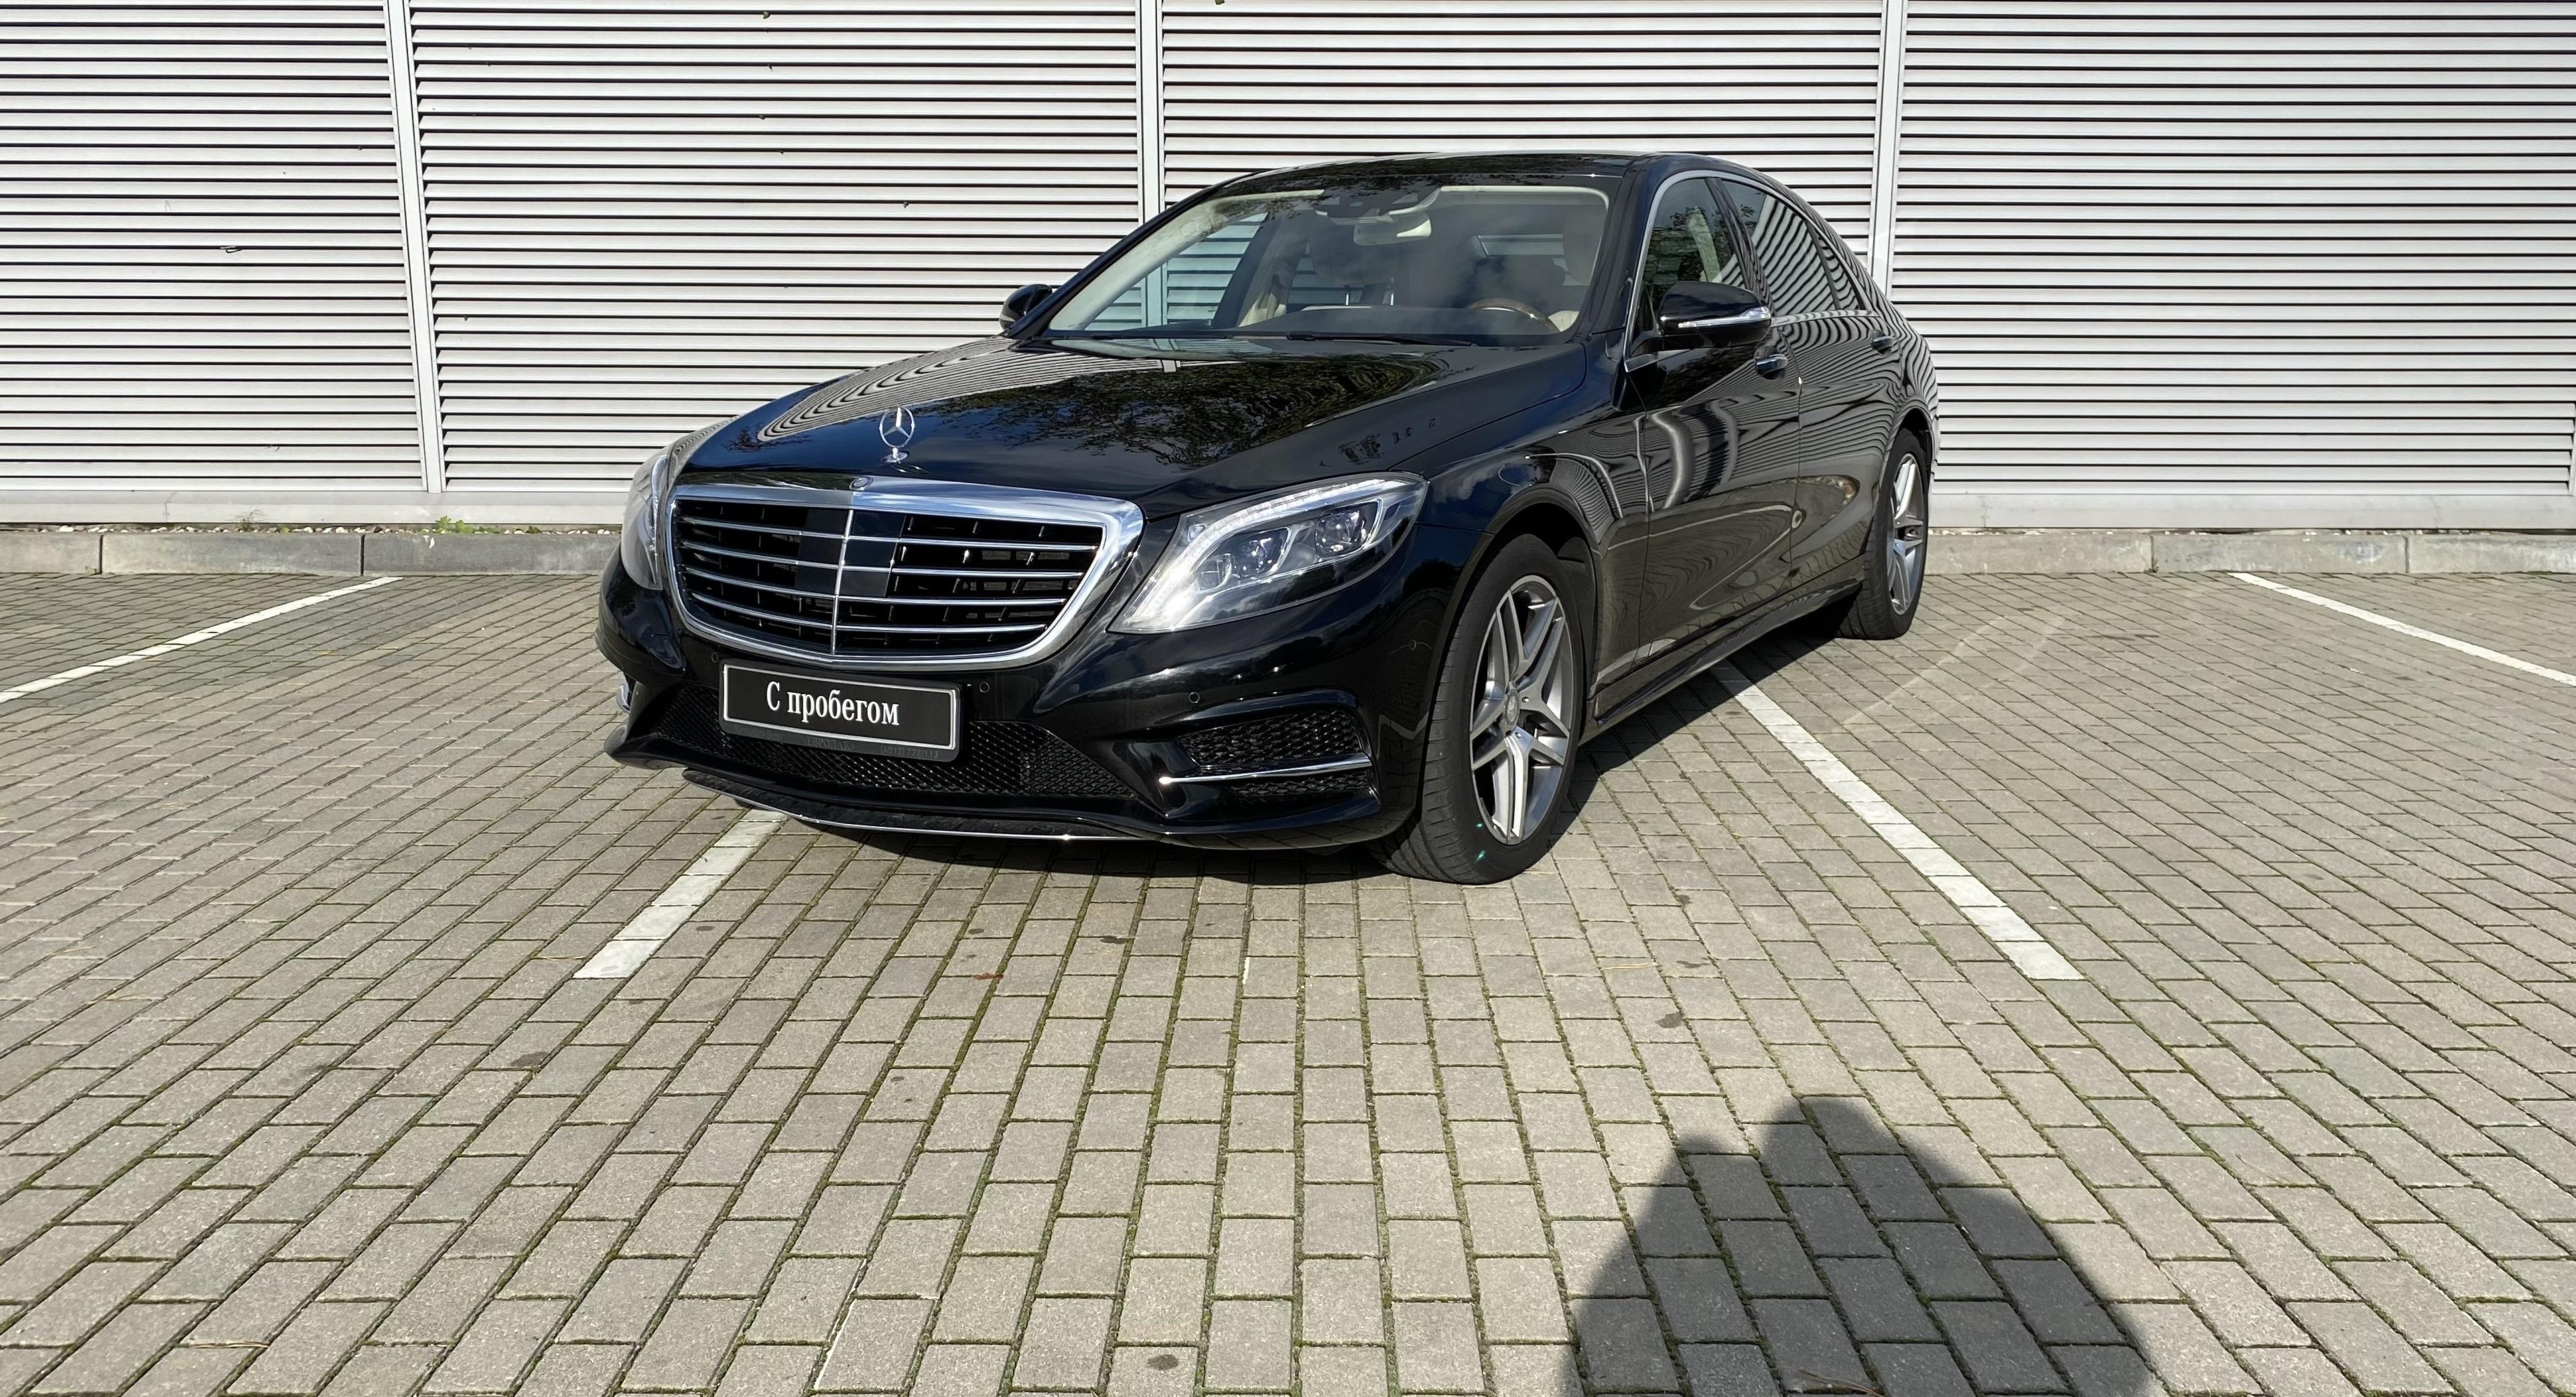 Mercedes-Benz S-Класс, VI (W222, C217)